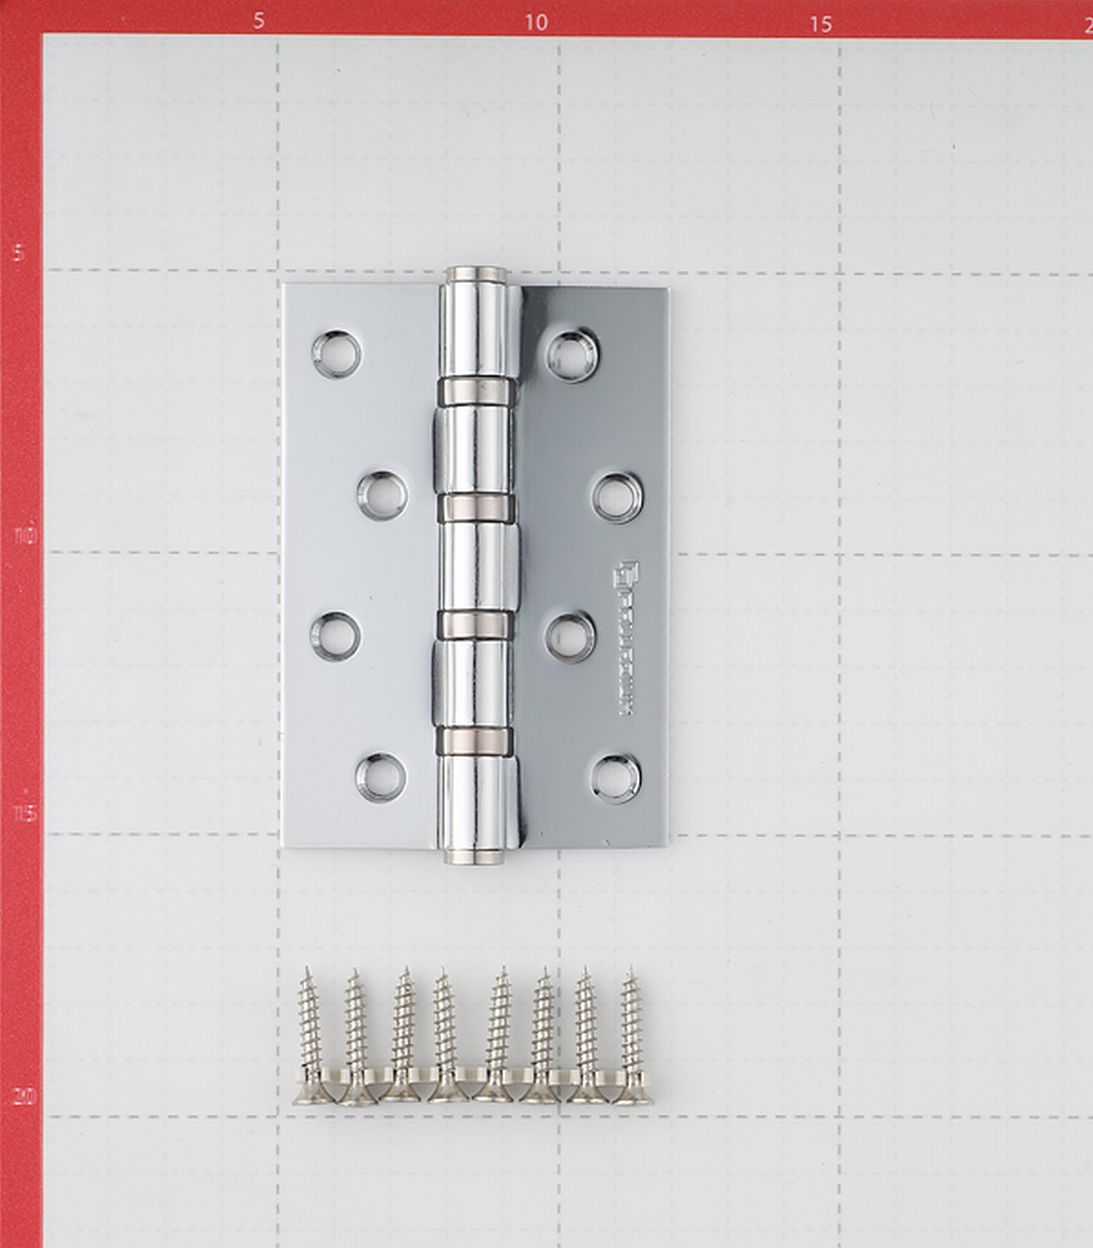 Петля Palladium N 4BB-100 CP универсальная неразъемная 100х75 мм серебро